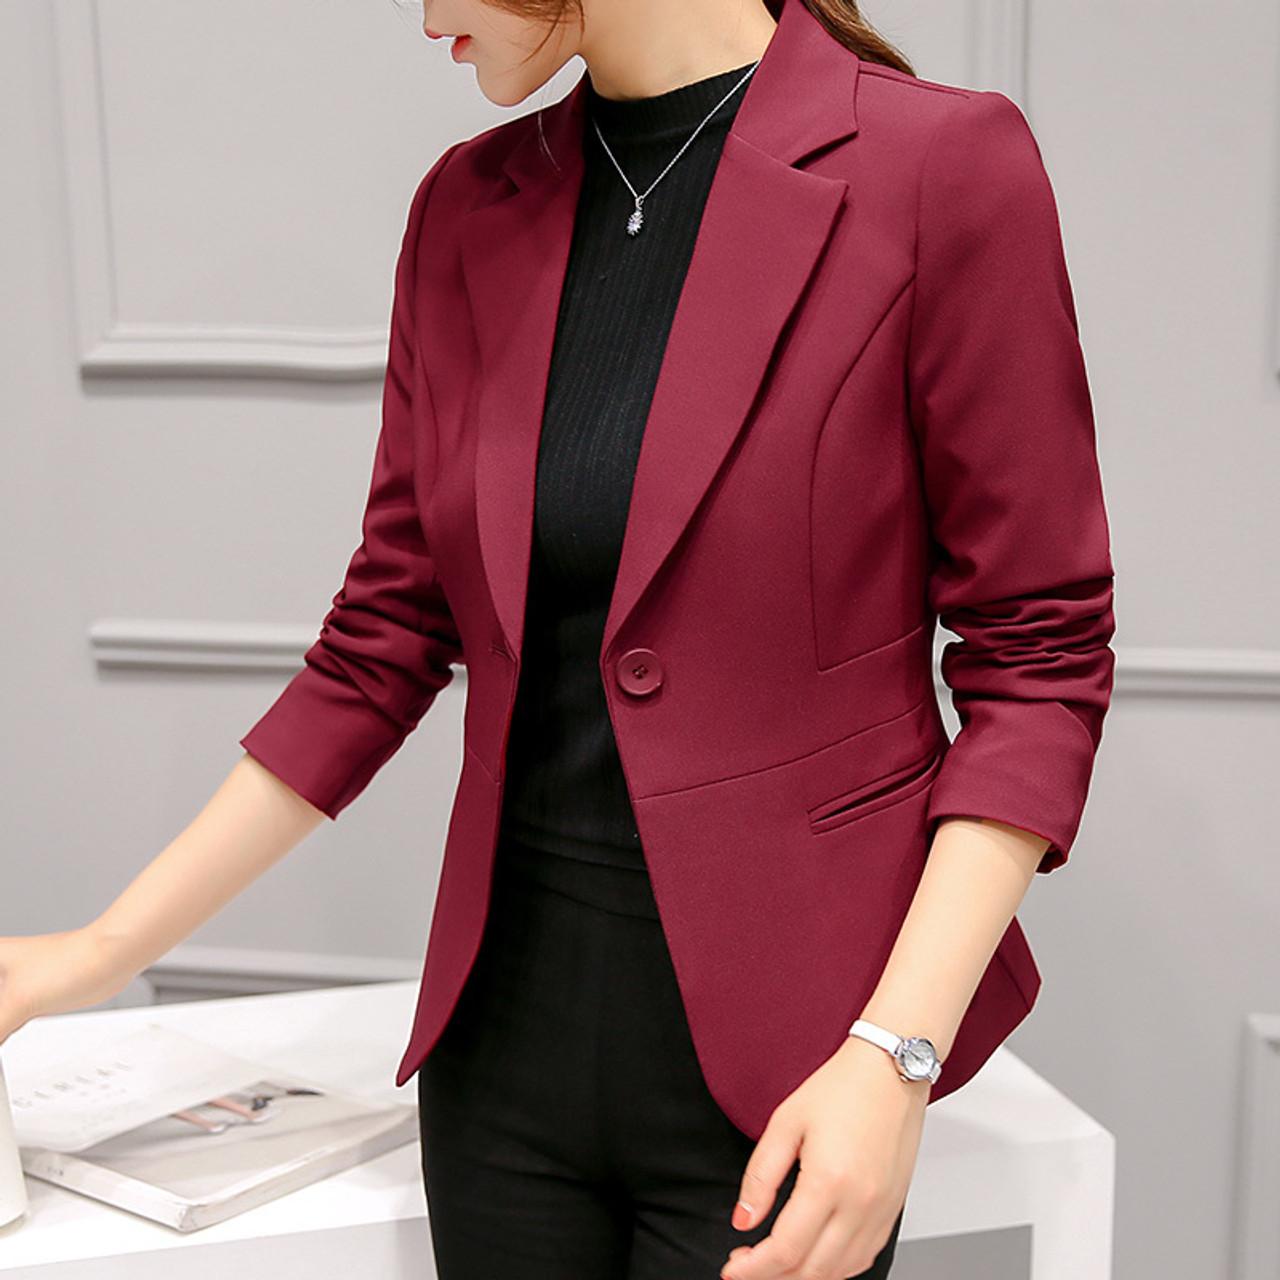 PEONFLY Ladies Blazers 2018 New Fashion Single Button Blazer Women Suit  Jacket bule/red Blaser Female Blazer Femme - OnshopDeals.Com